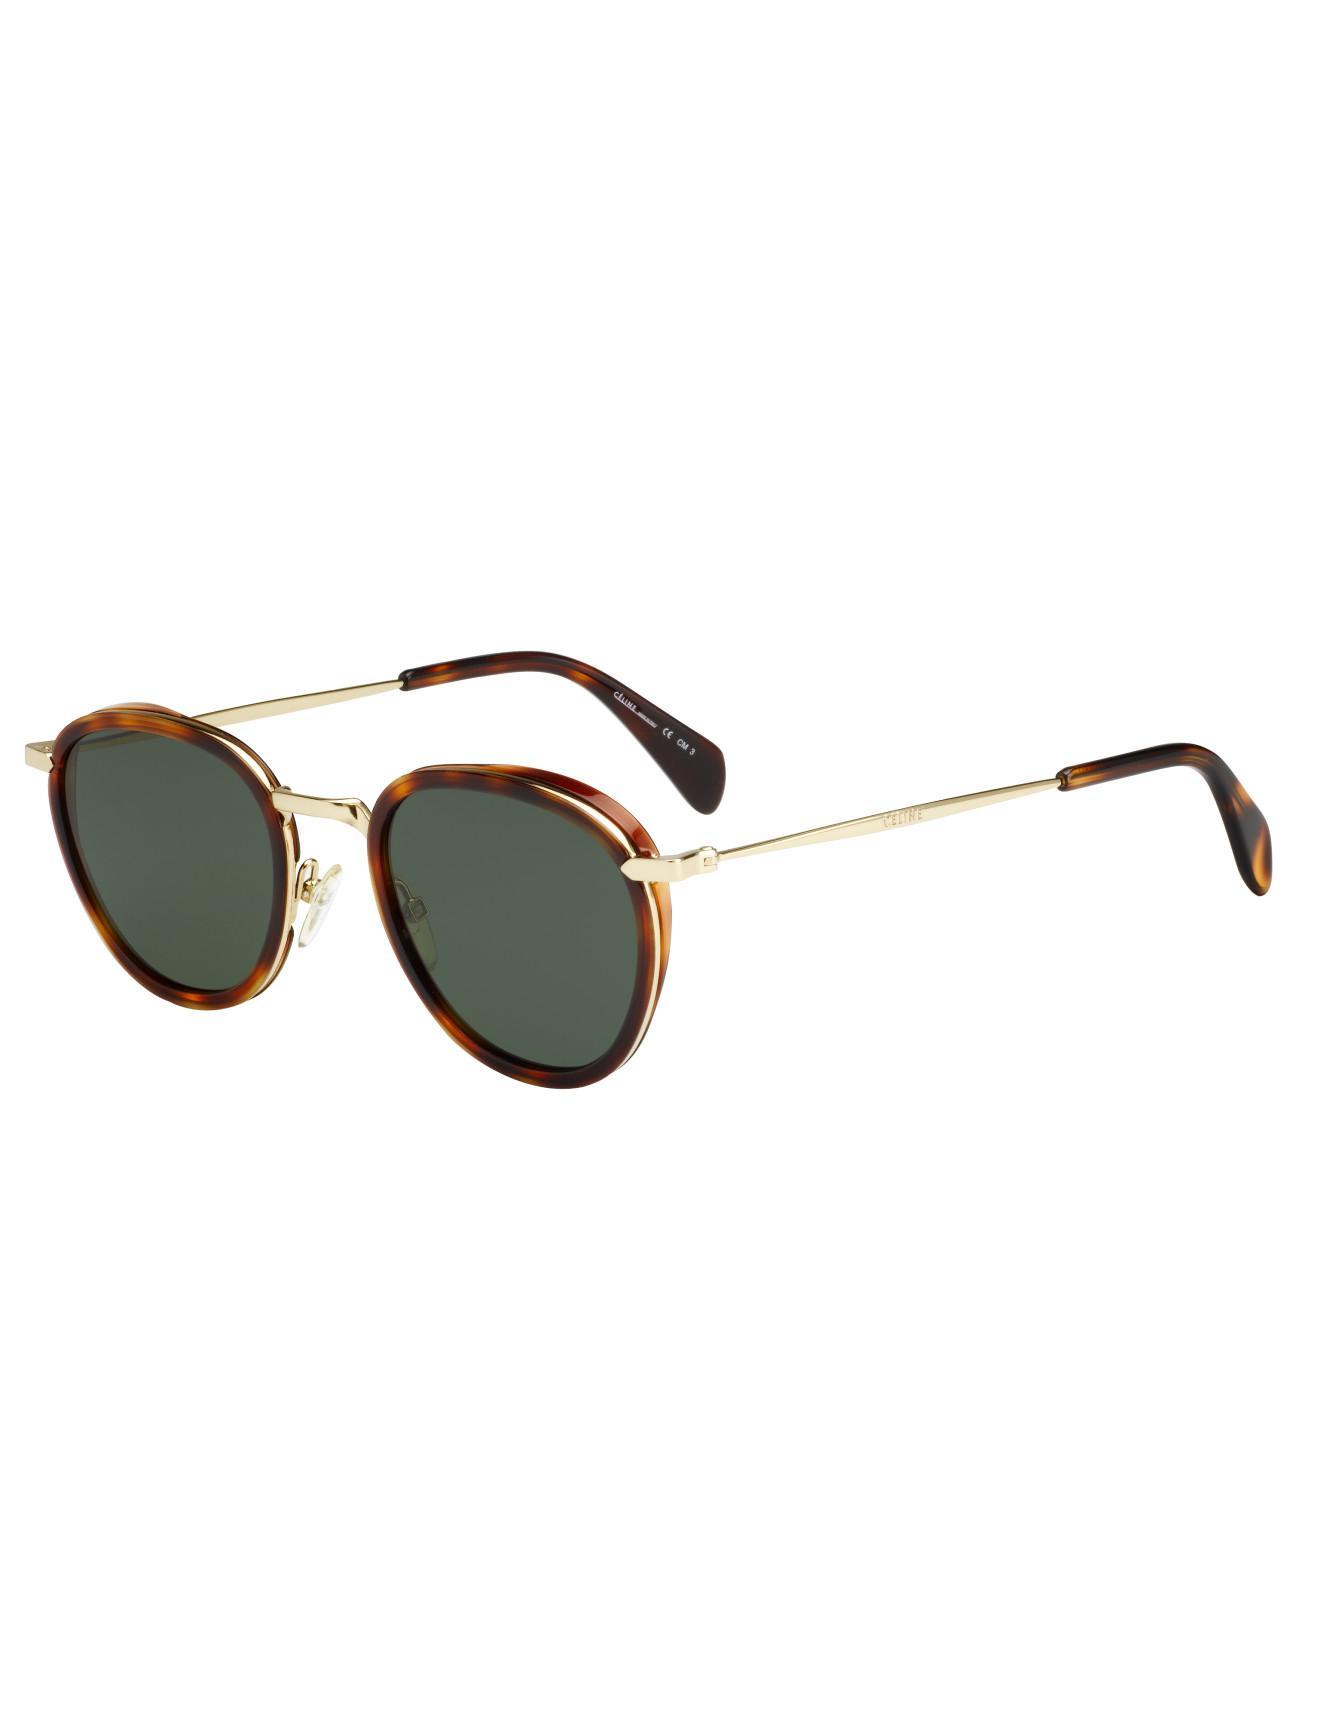 0c47f9ae07c9 Gallery. Previously sold at  David Jones · Women s Chloe Isidora Women s  Brown Sunglasses Women s Ray Ban ...